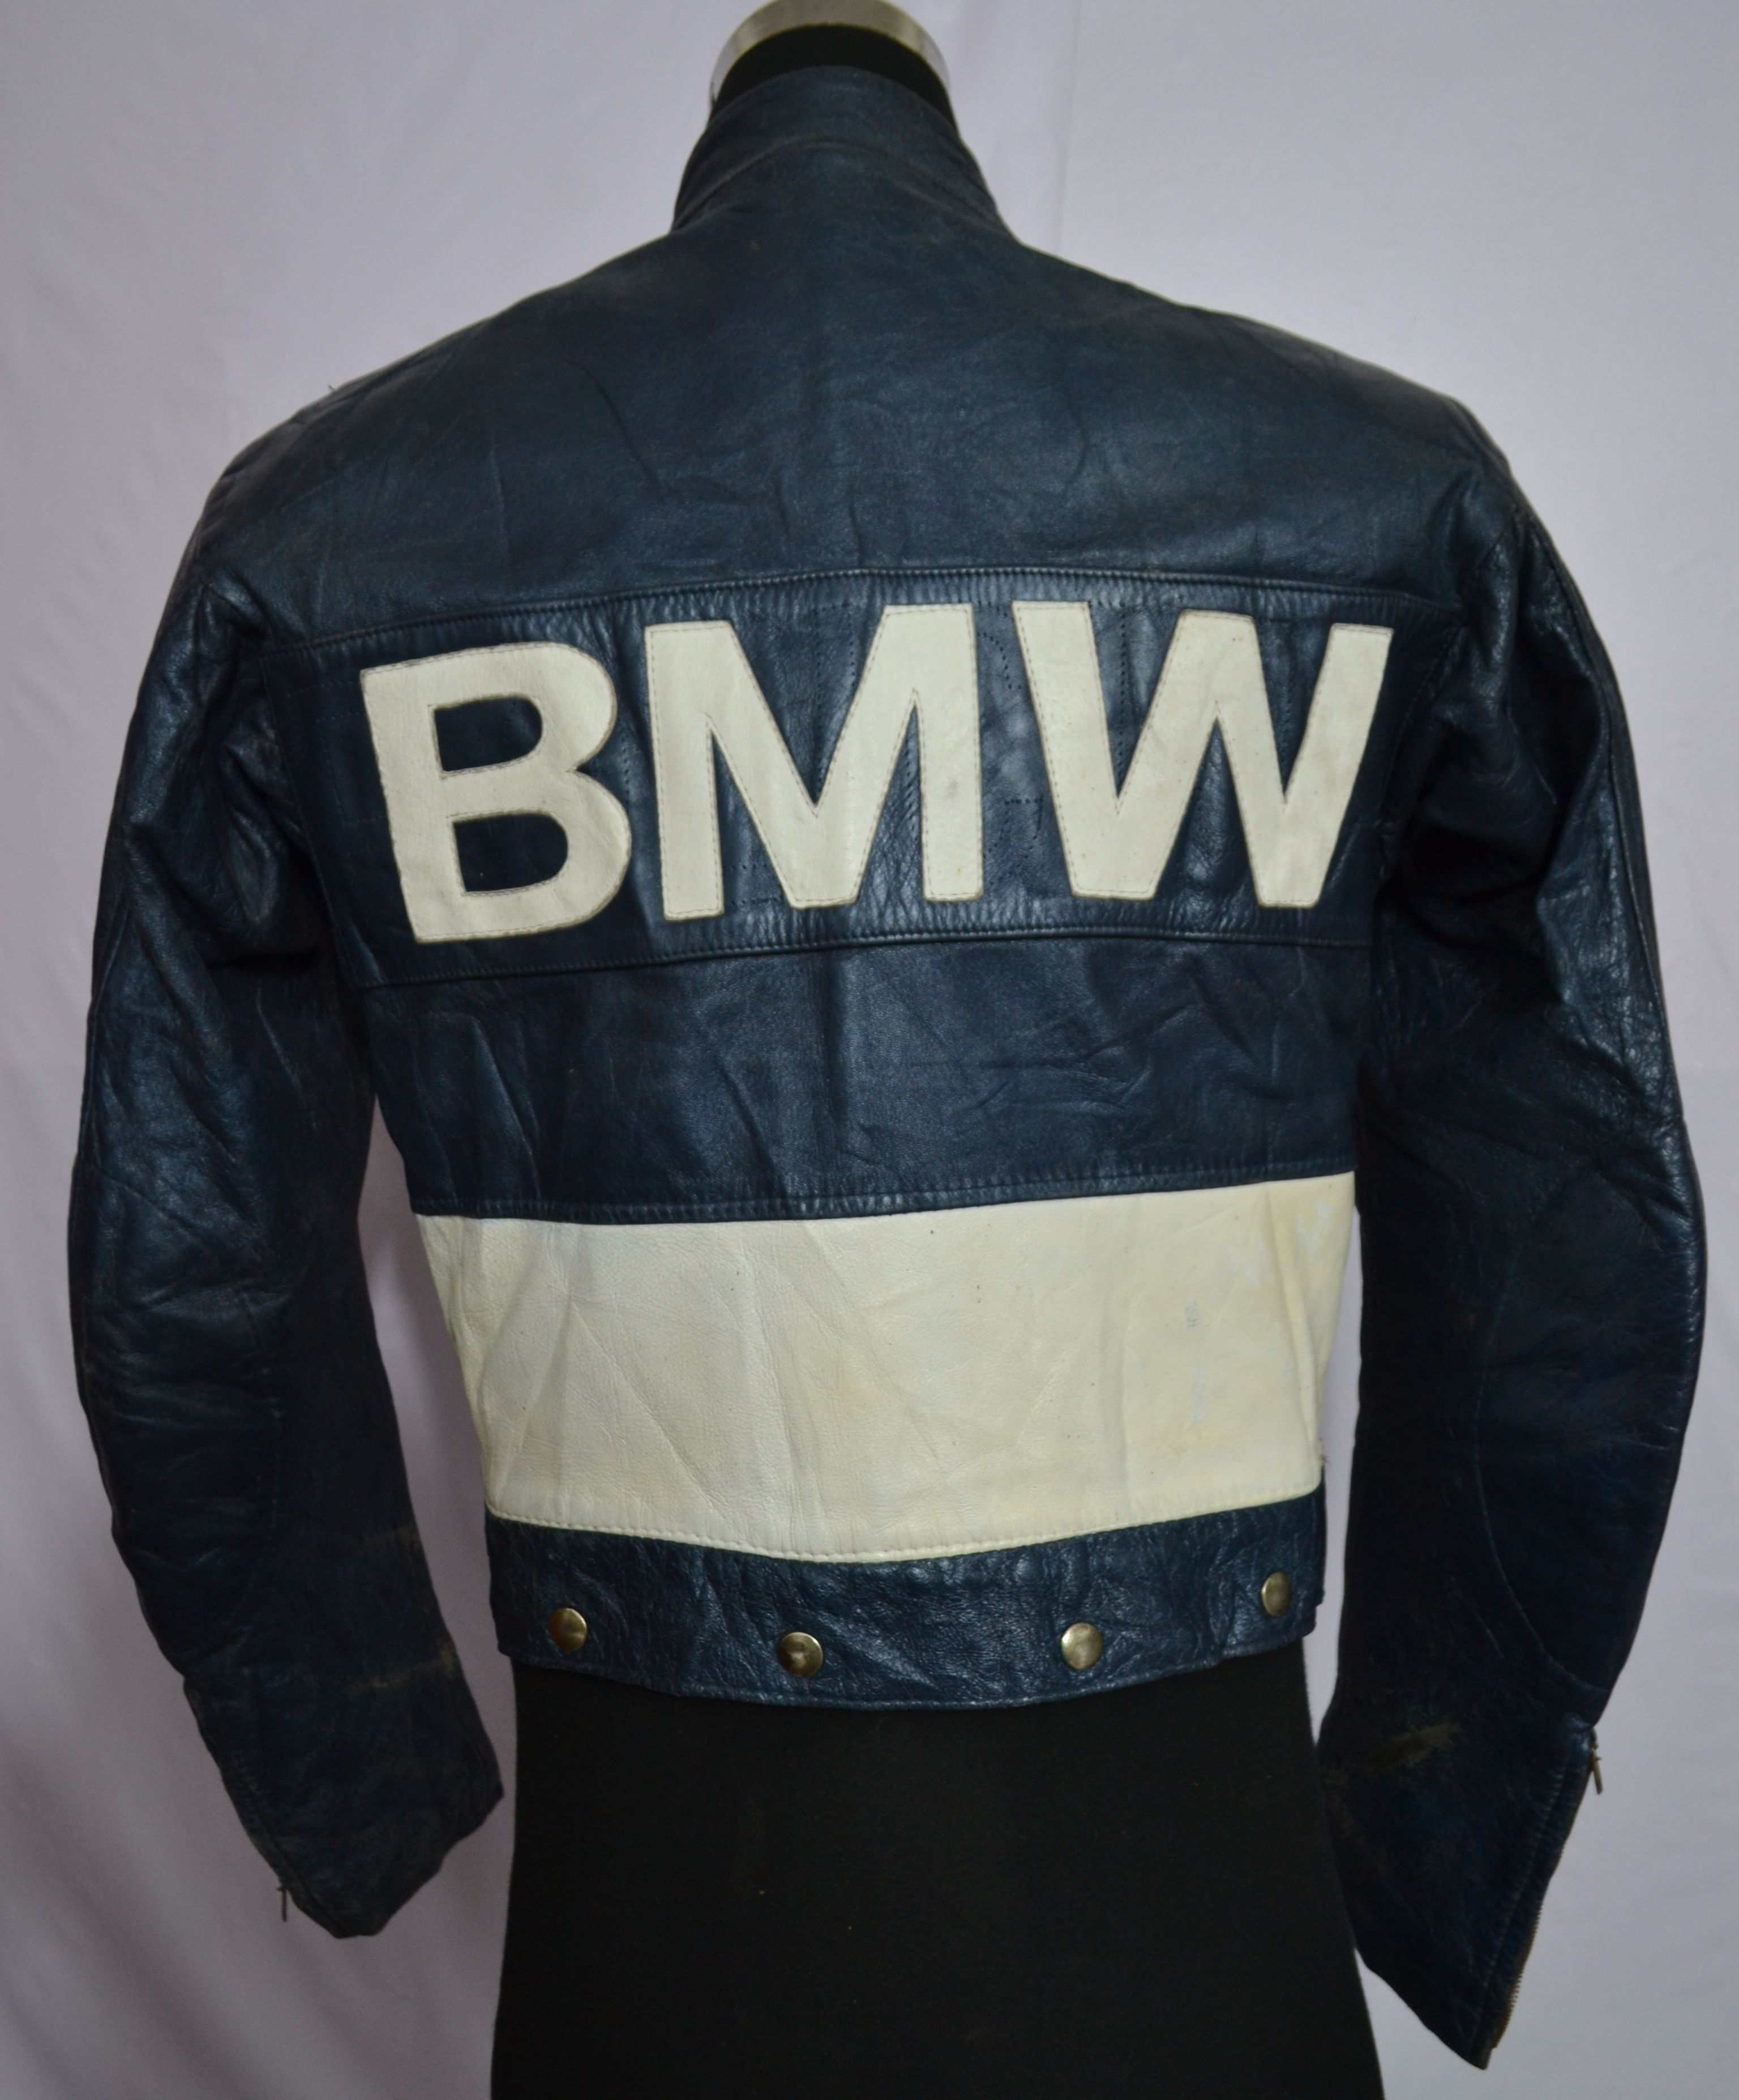 Bmw Motorbike Leather Jacket Vintage Brands Guru Please Visit Our Customise Wholesale Website For Collectio Vintage Leather Jacket Motorbike Jackets Jackets